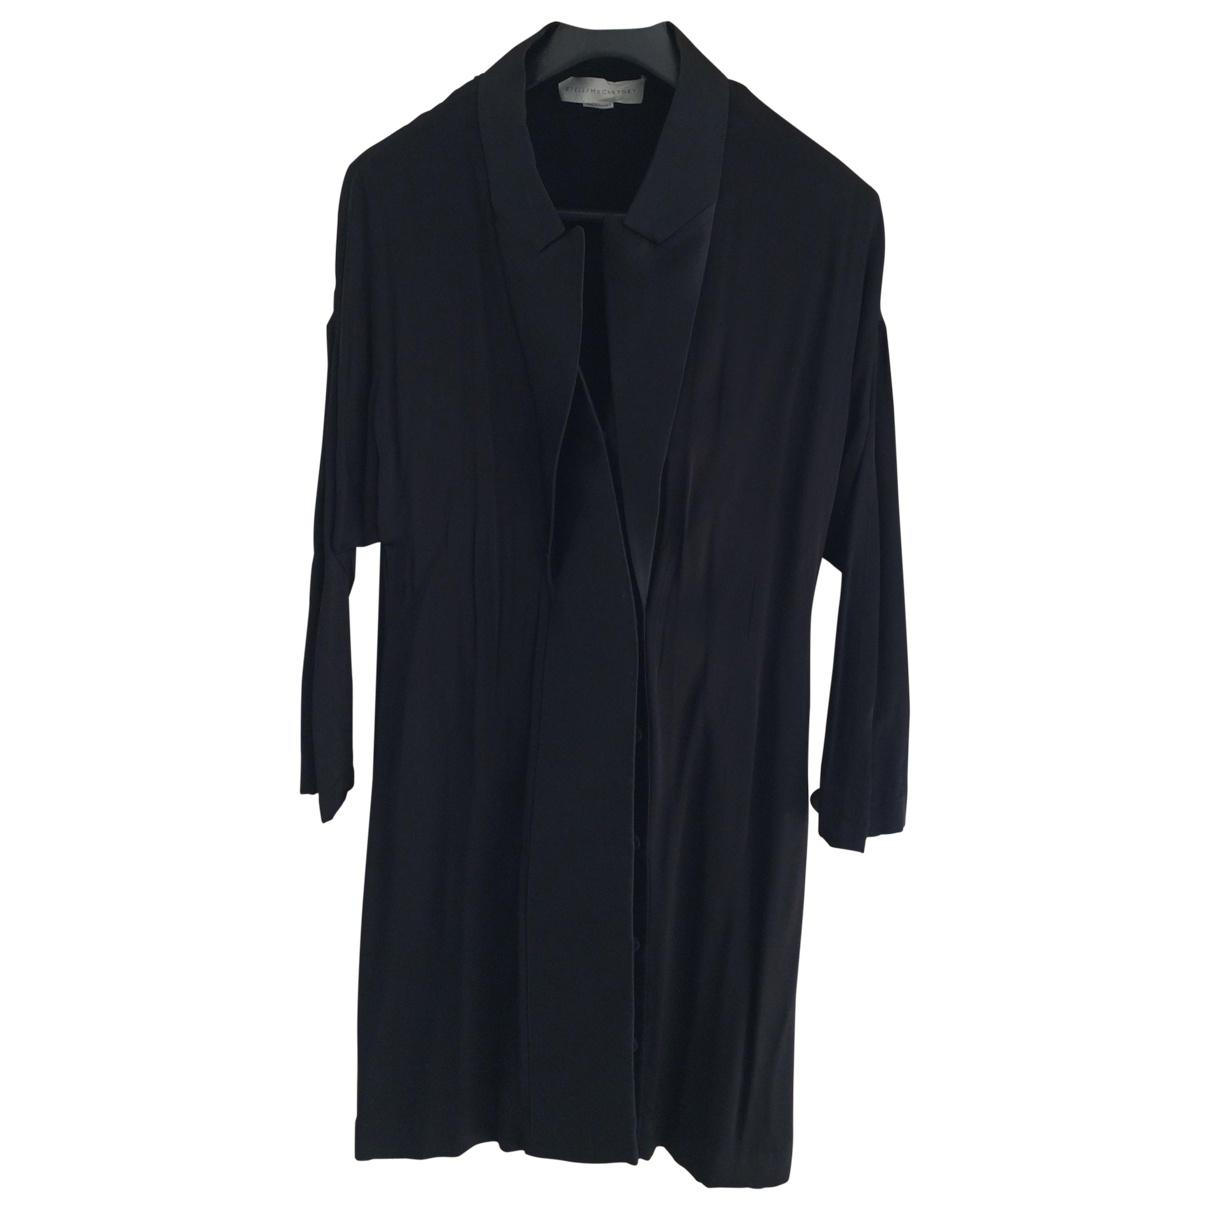 Stella Mccartney \N Black dress for Women 38 FR